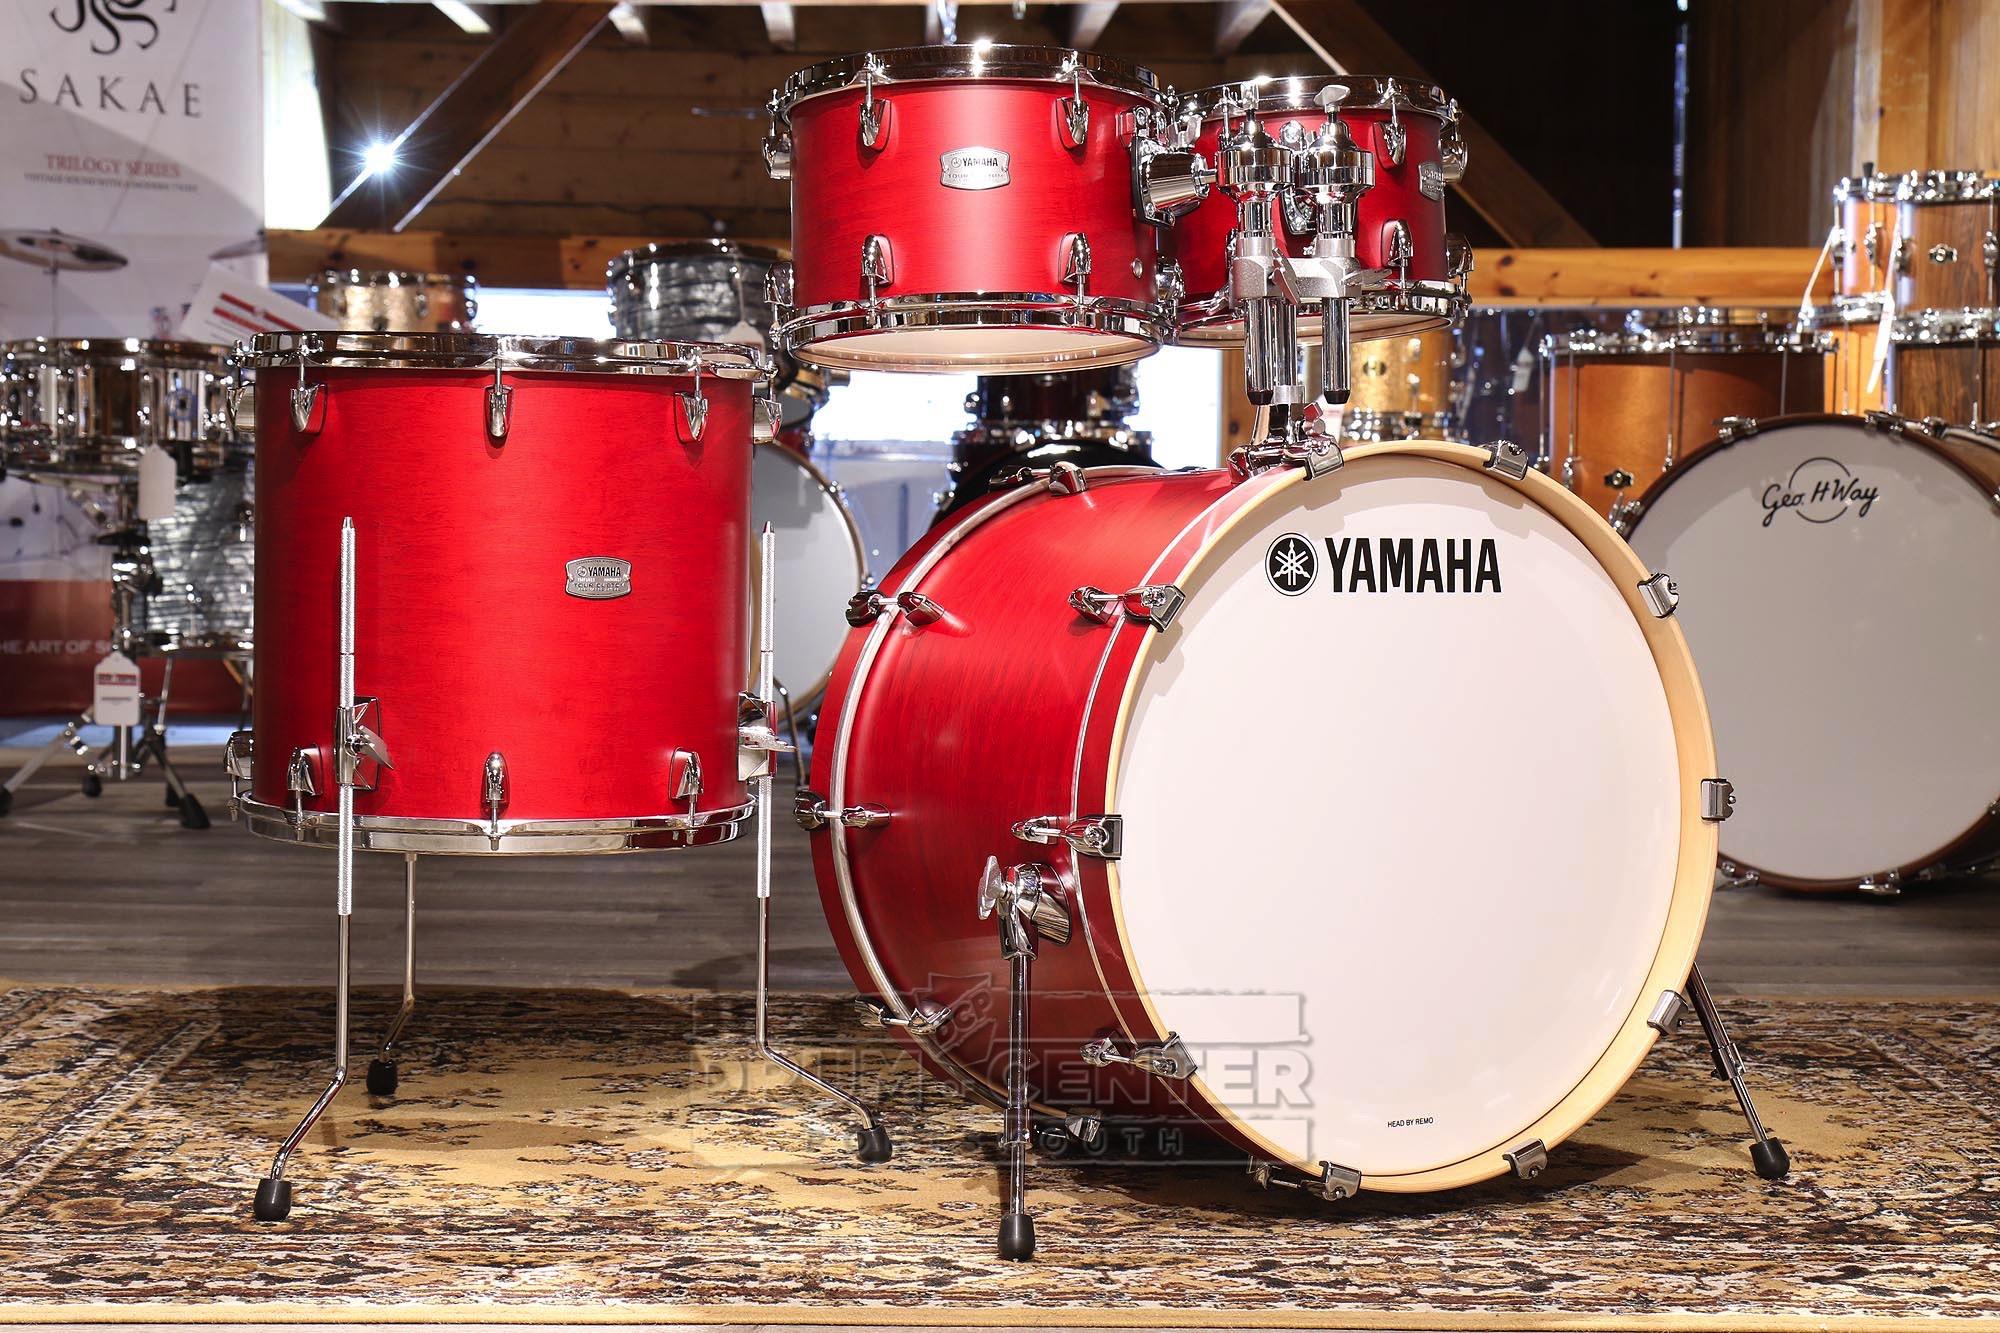 yamaha tour custom maple 4pc drum set 22 10 12 16 candy apple satin 889025112710 ebay. Black Bedroom Furniture Sets. Home Design Ideas